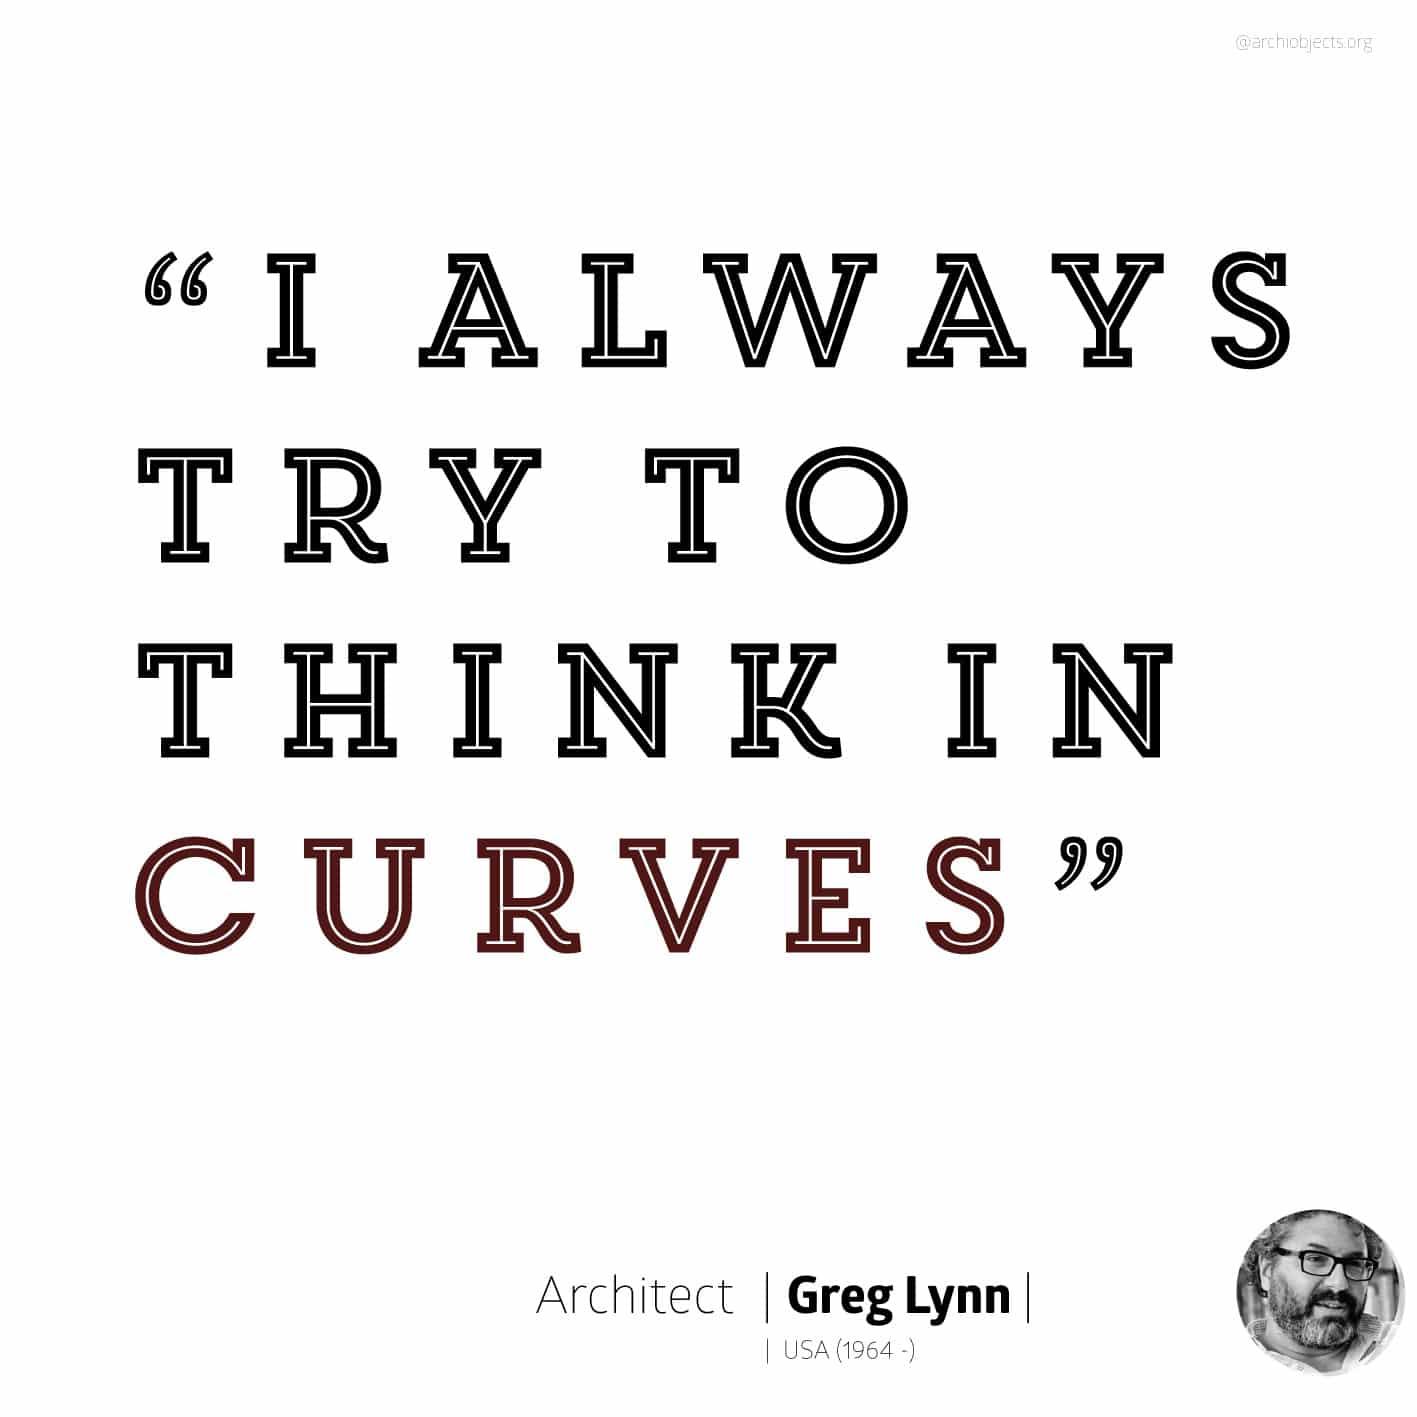 greg lynn quote